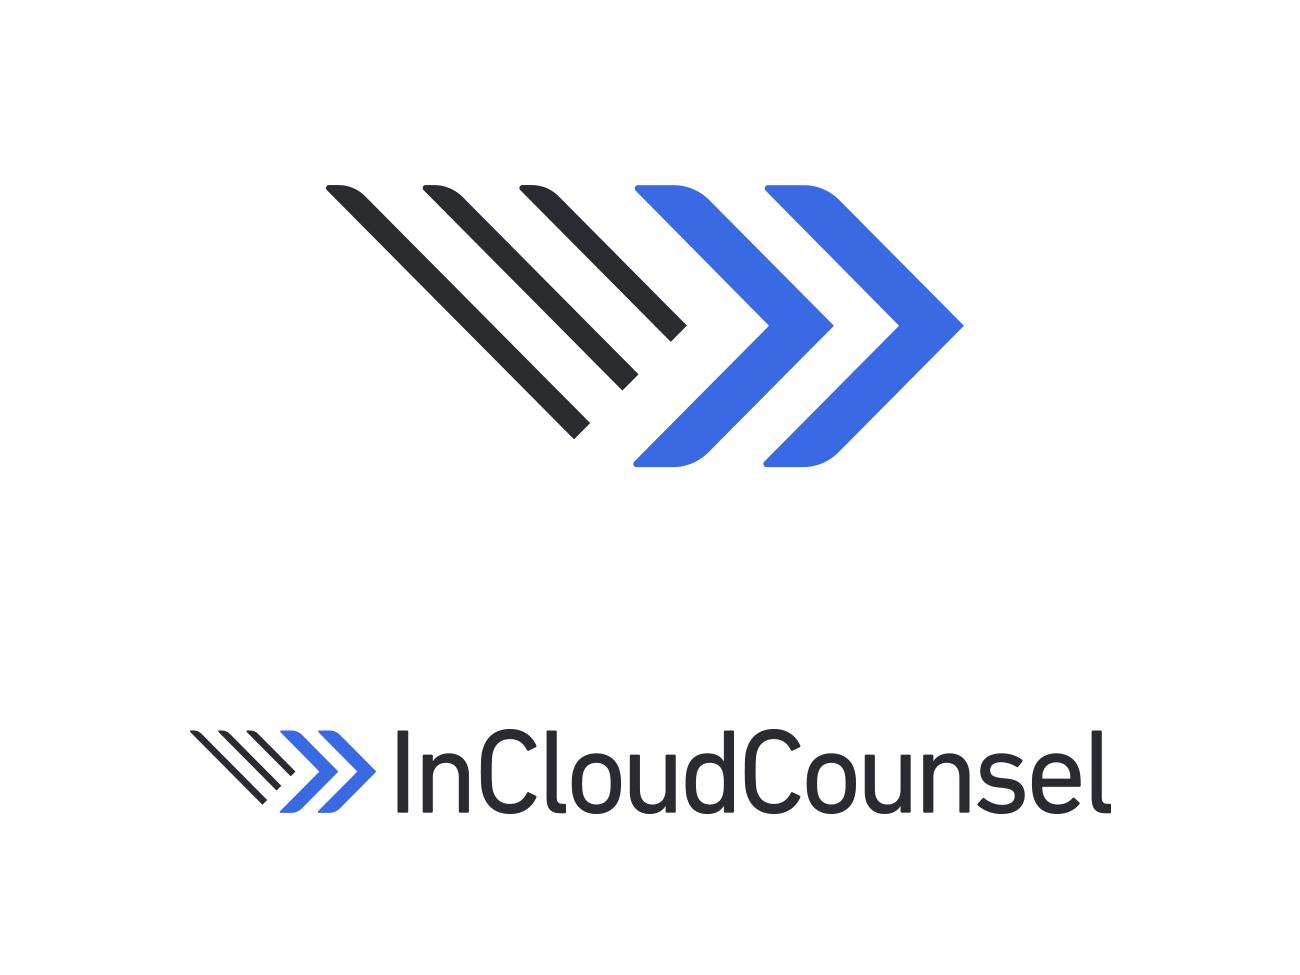 InCloudCounsel Logo service legal document identity branding identity logo